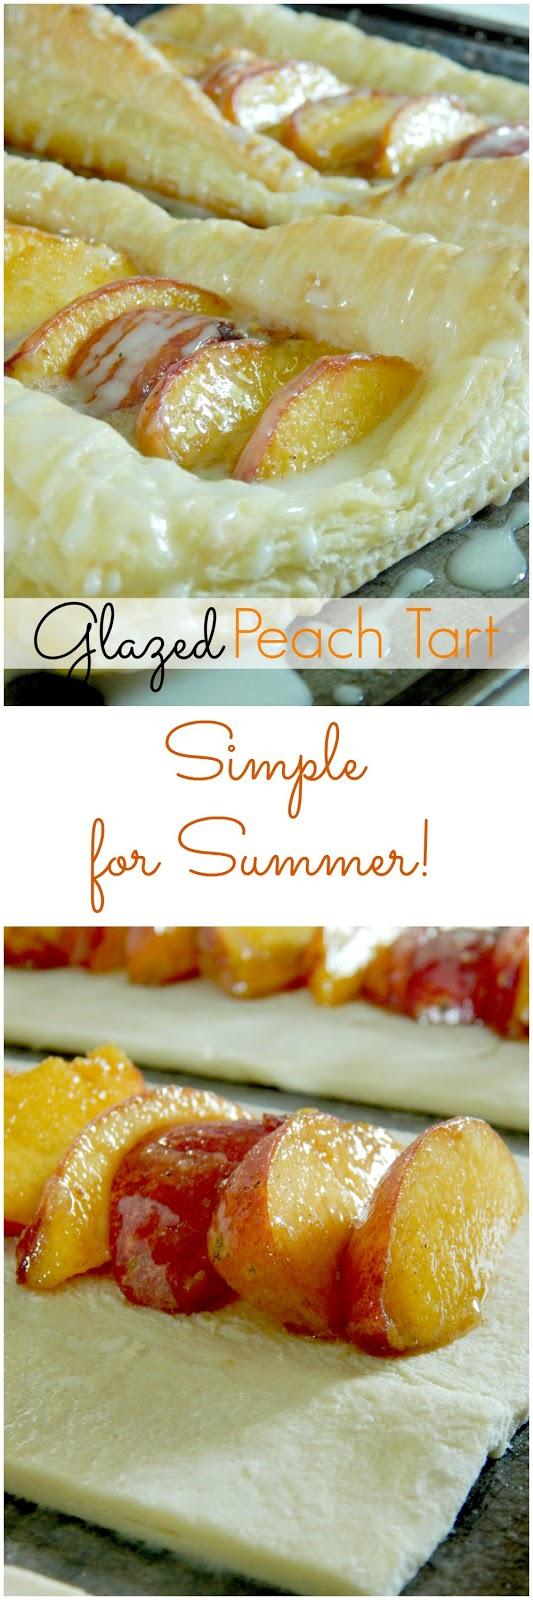 glazed peach tart (sweetandsavoryfood.com)